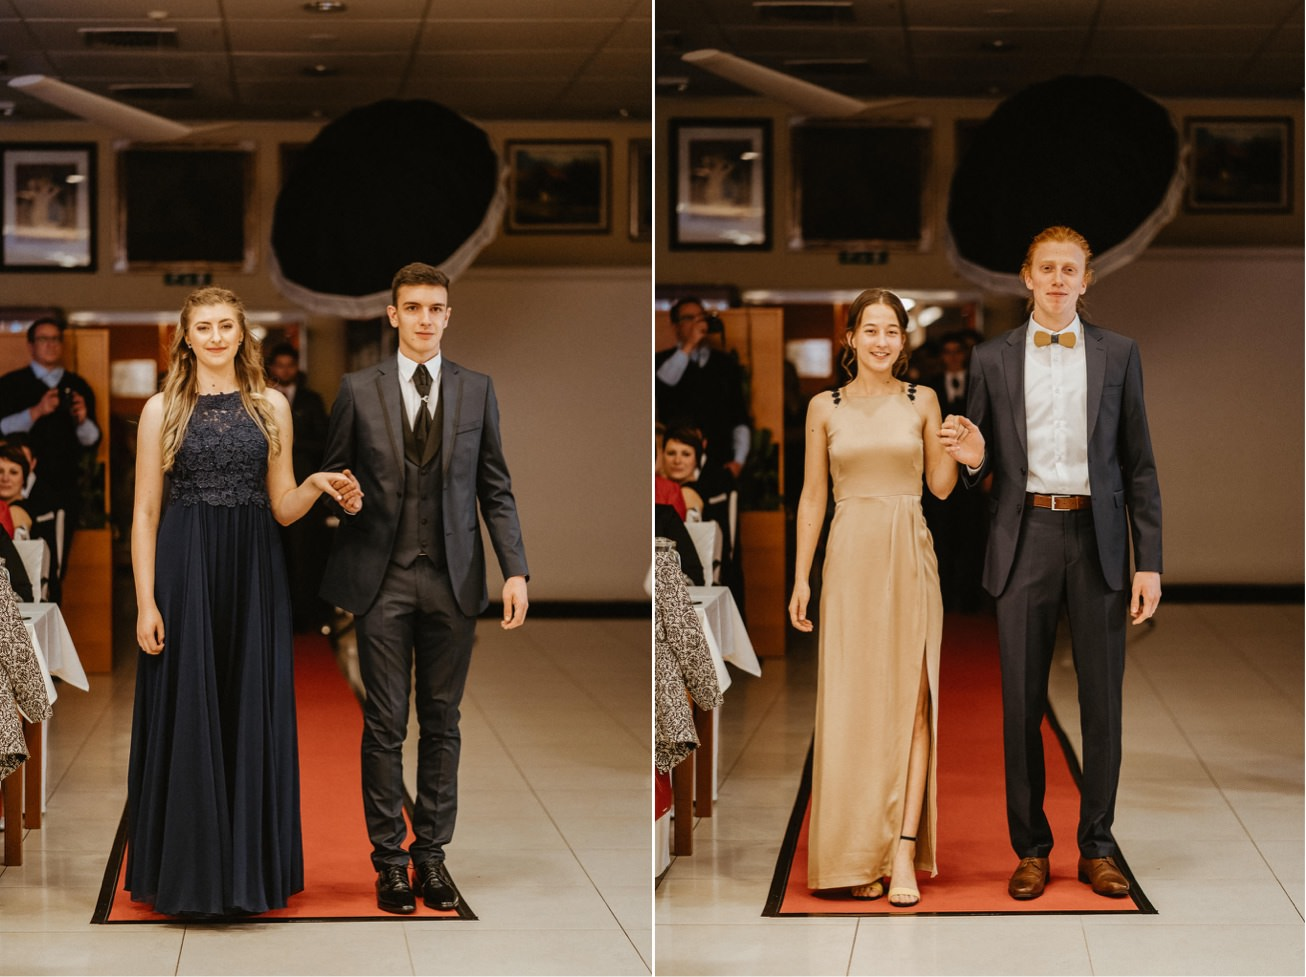 Hotel Dolenjc Maturantski ples fotograf 26